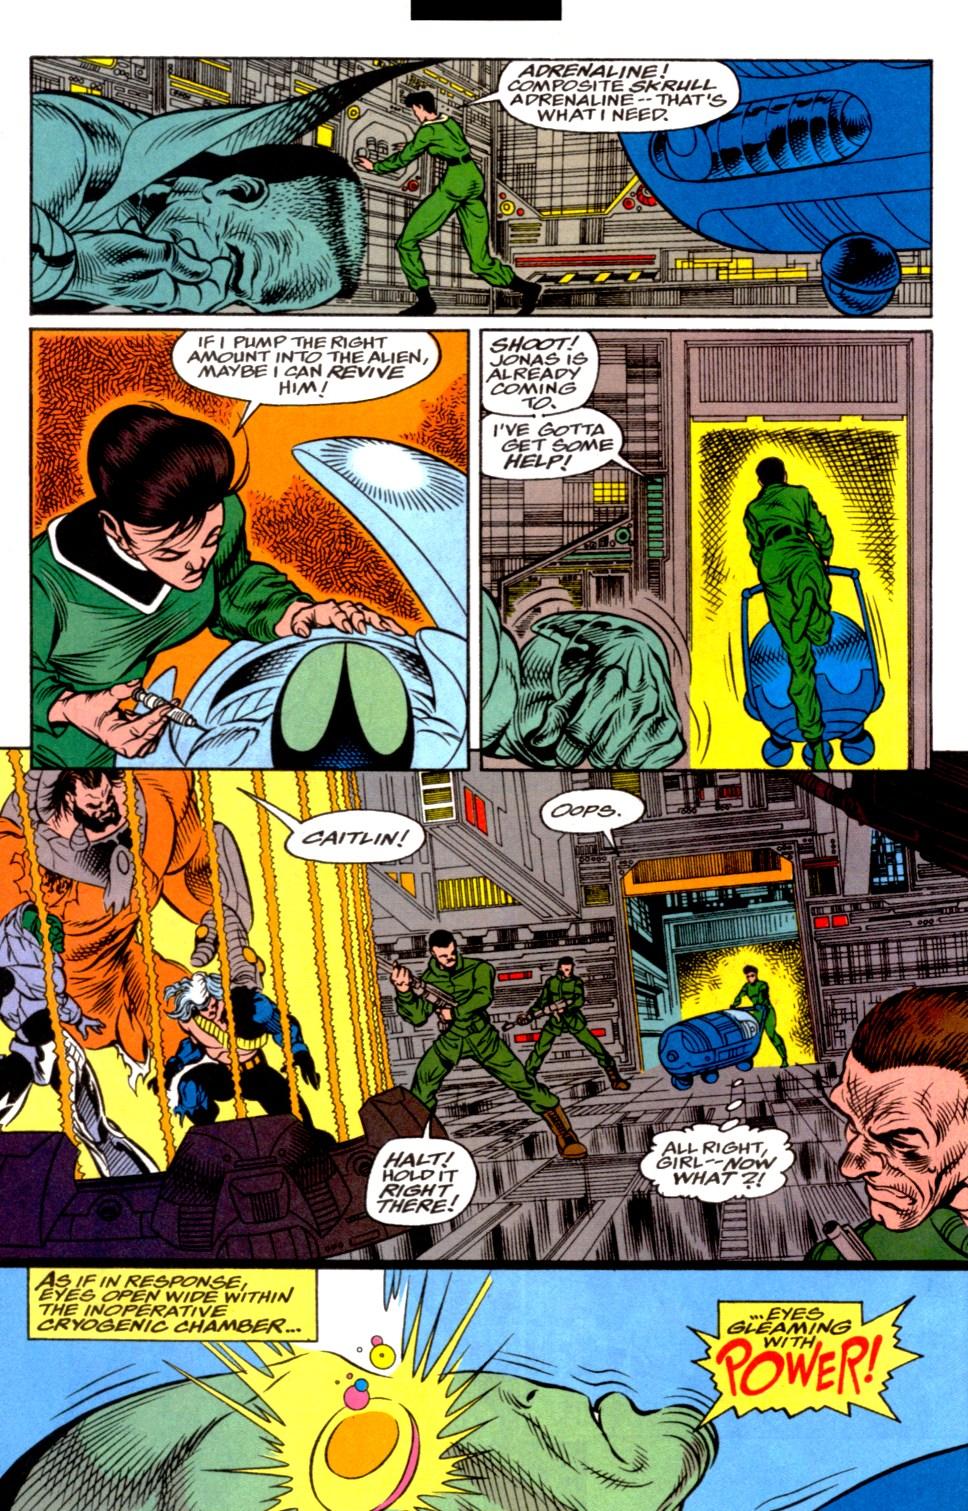 Read online Blackwulf comic -  Issue #4 - 5